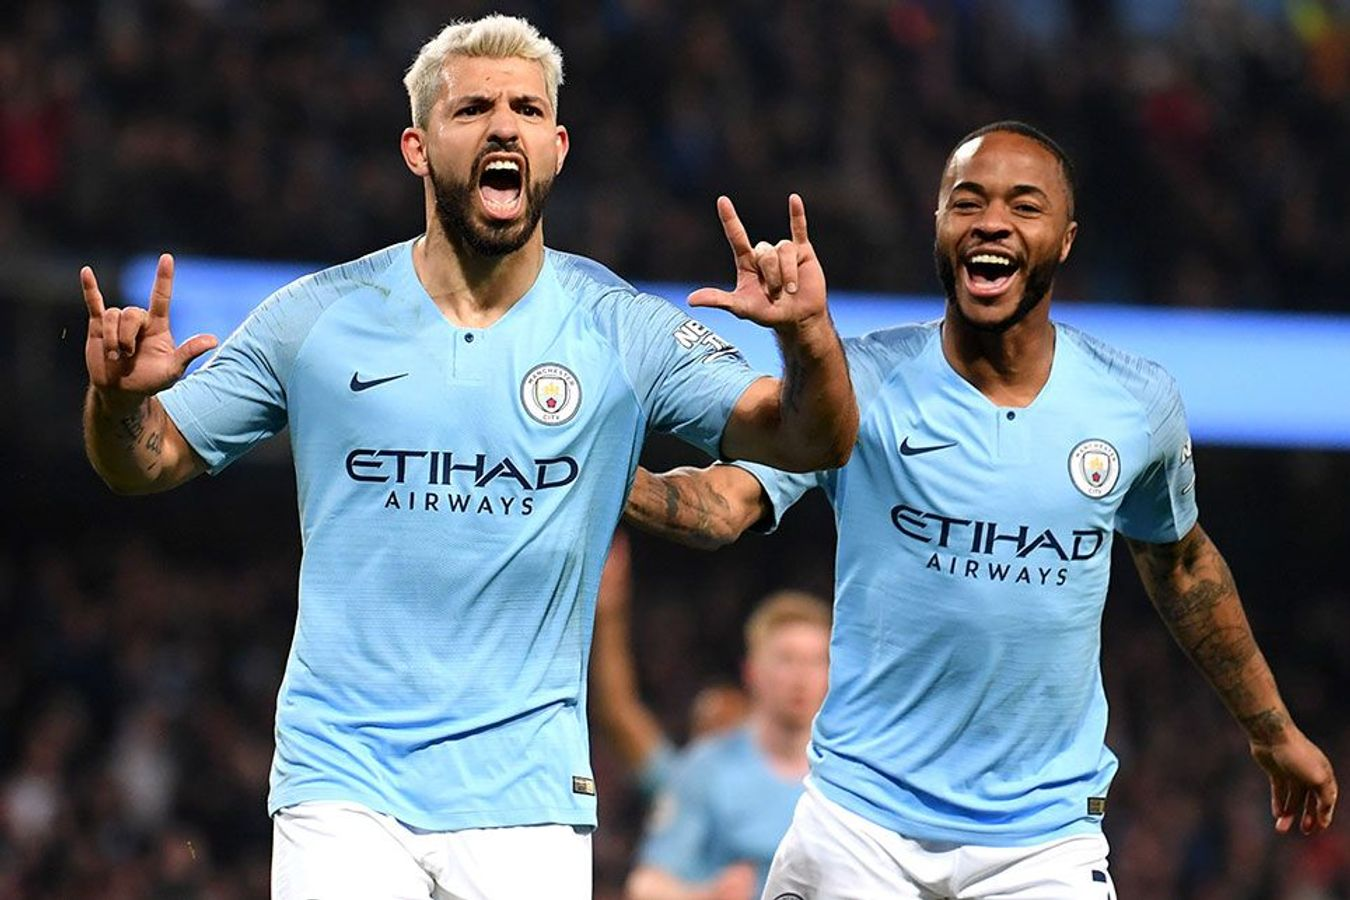 Sergio Aguero and Raheem Sterling, Man City